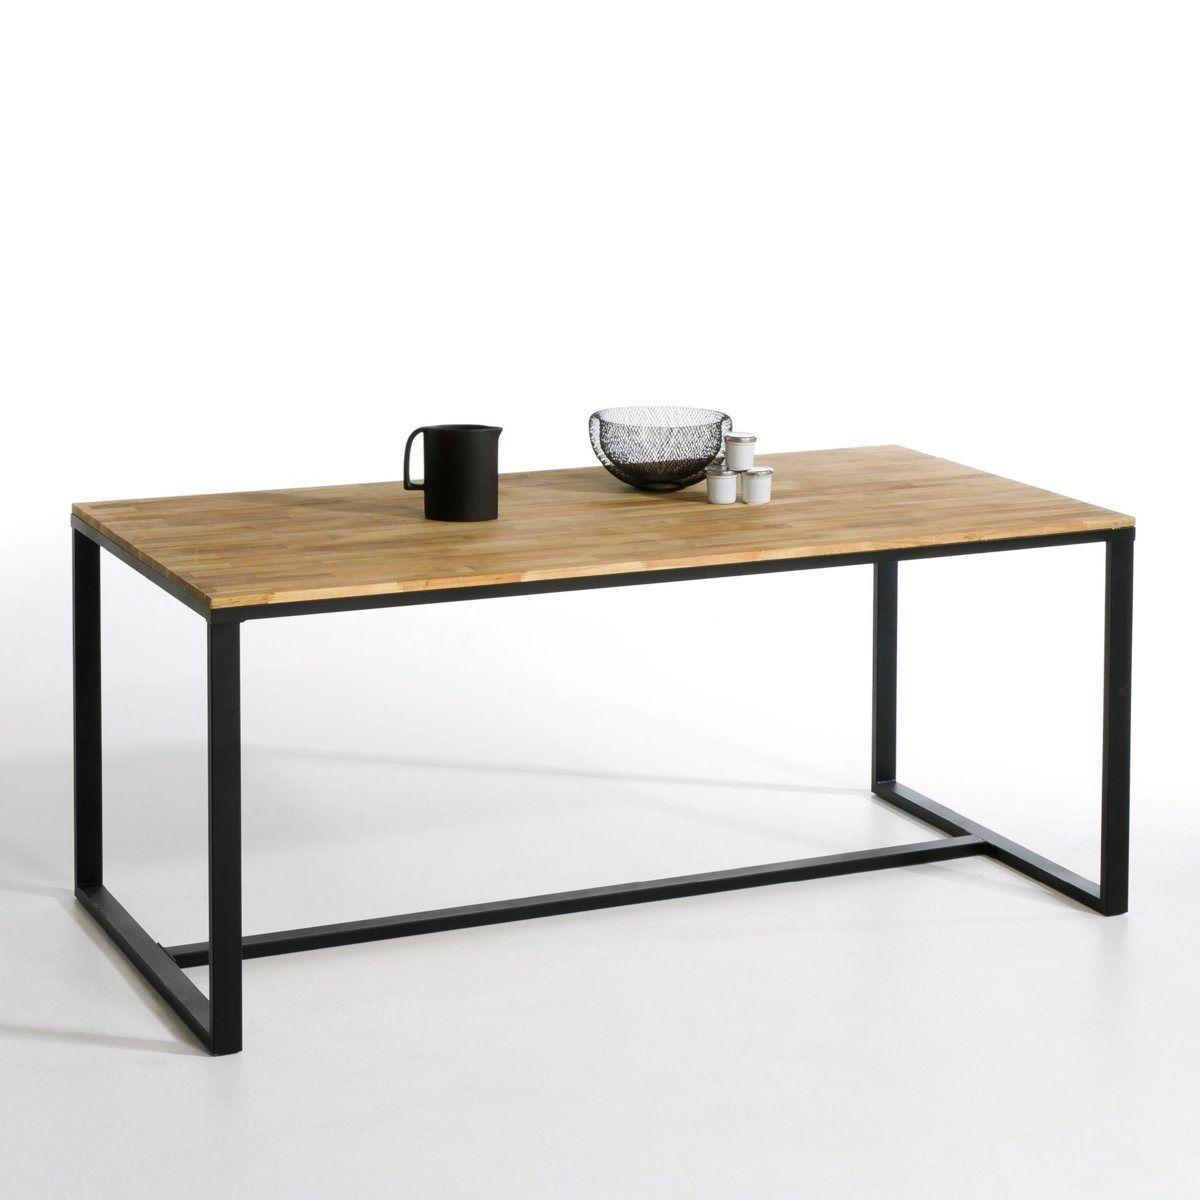 table 6 8 couverts en noyer massif et acier hiba 240 d coration. Black Bedroom Furniture Sets. Home Design Ideas